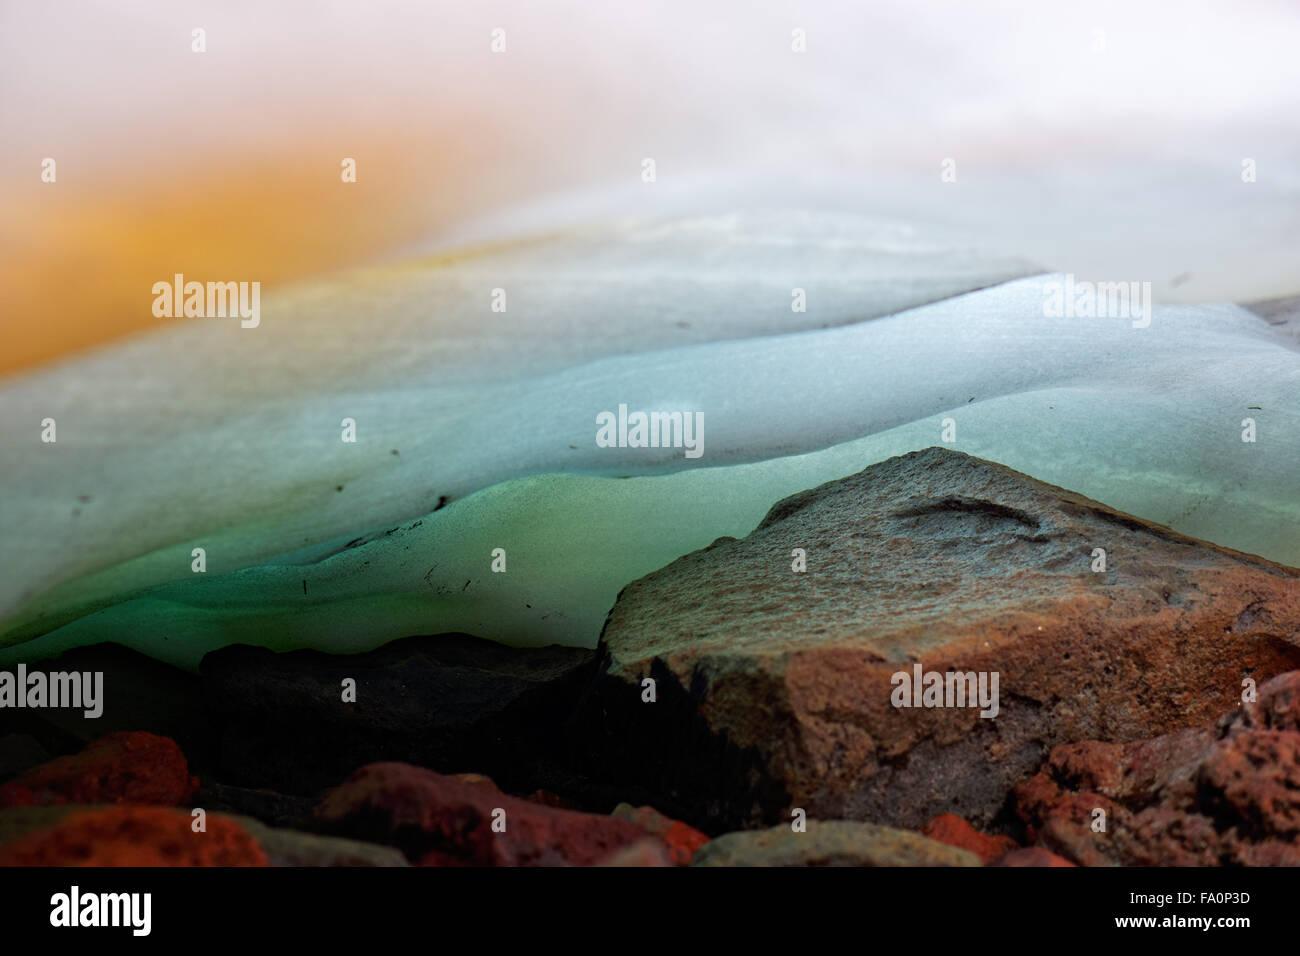 Underside of snowfield melting onto rocks, Spray Park, Mount Rainier National Park, Washington State, USA - Stock Image